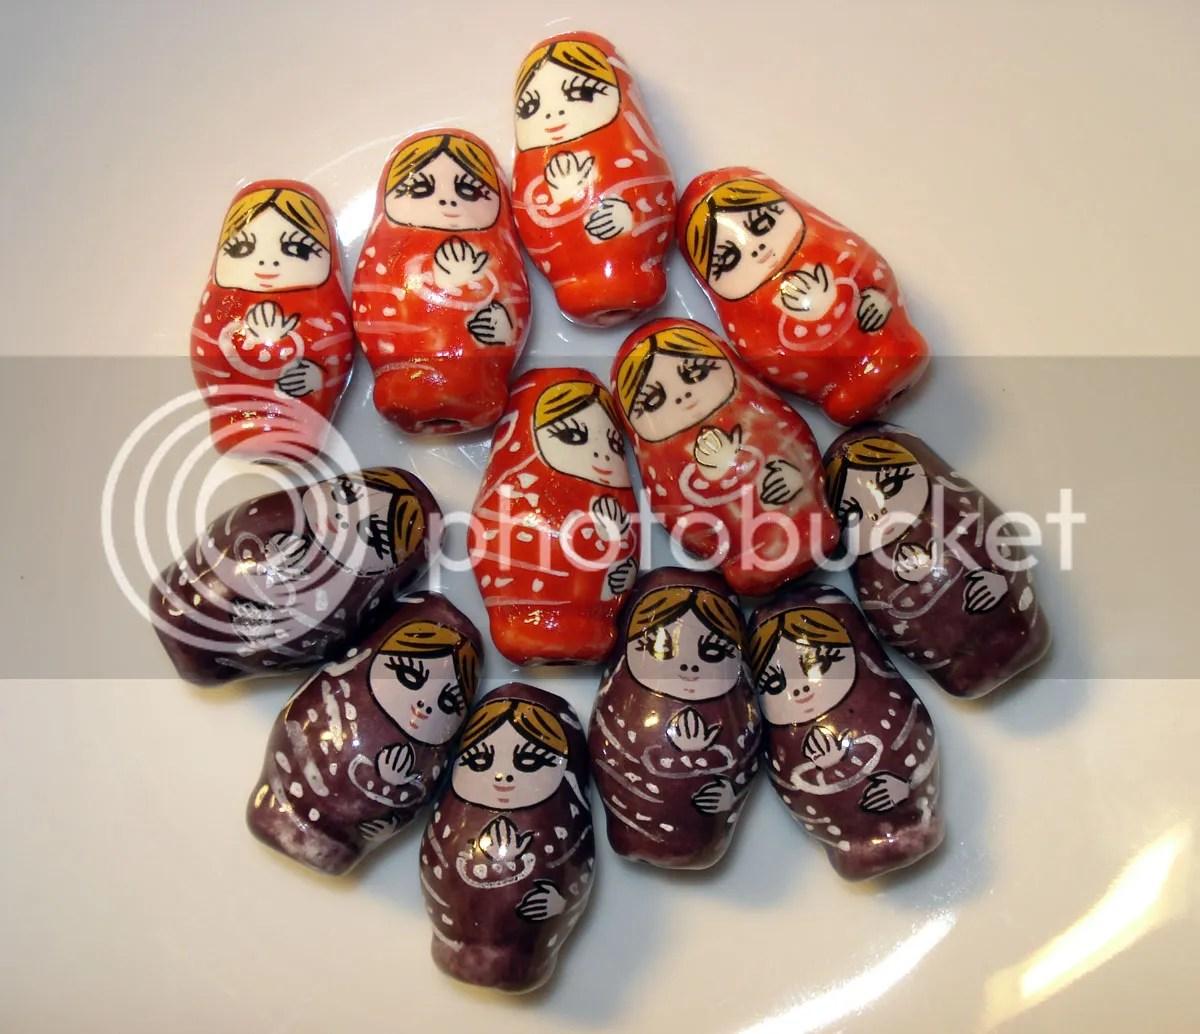 Beadcrafty.com Porcelain Russian Doll Beads